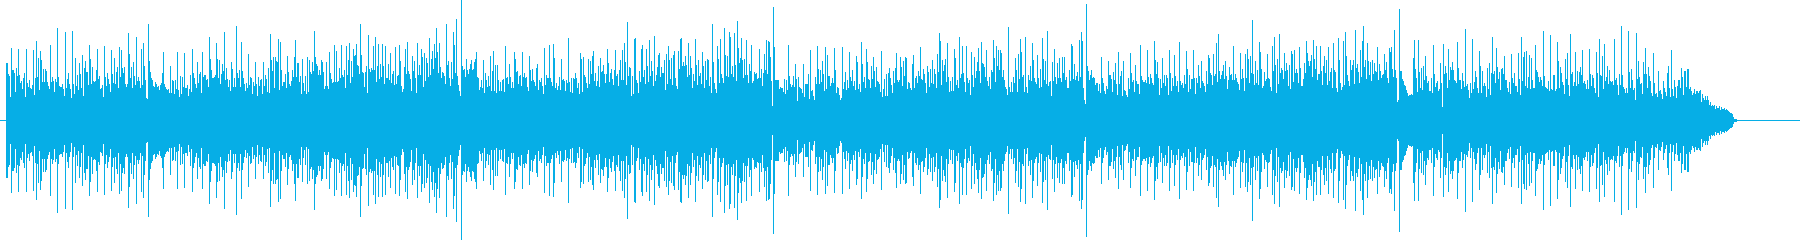 60'sポップス風ボサノヴァアンサンブルの再生済みの波形